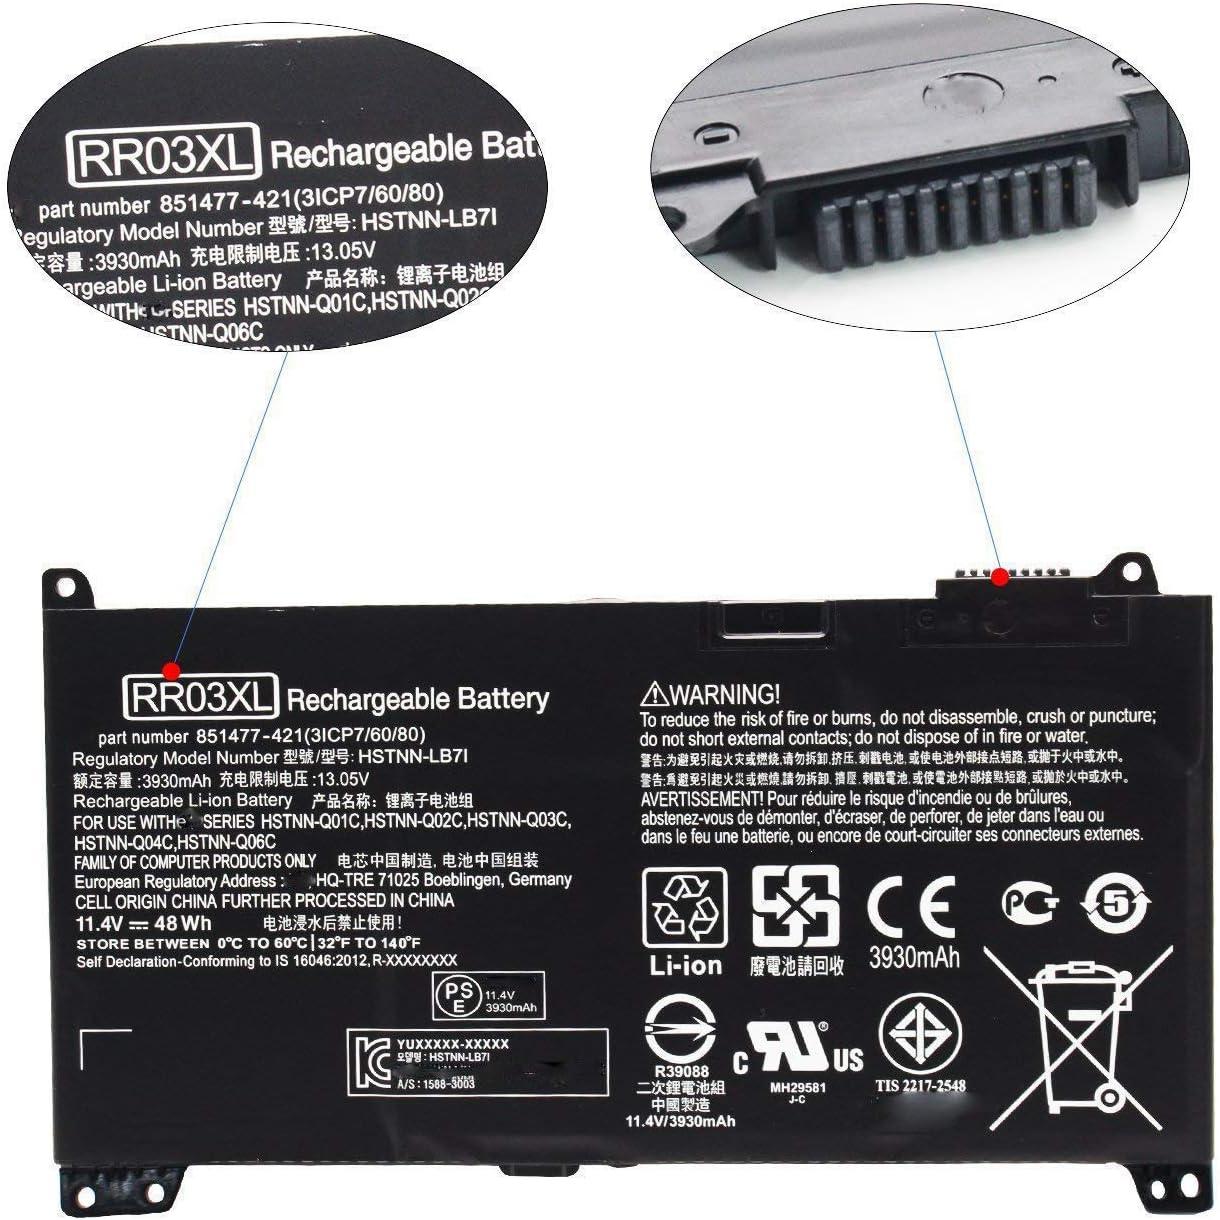 ASKC 11.4V 48Wh RR03XL Laptop Battery for HP ProBook 430 440 450 455 470 G4 mt20 Series 851477-421 851477-541 851477-831 851610-850 HSTNN-LB7I HSTNN-PB6W